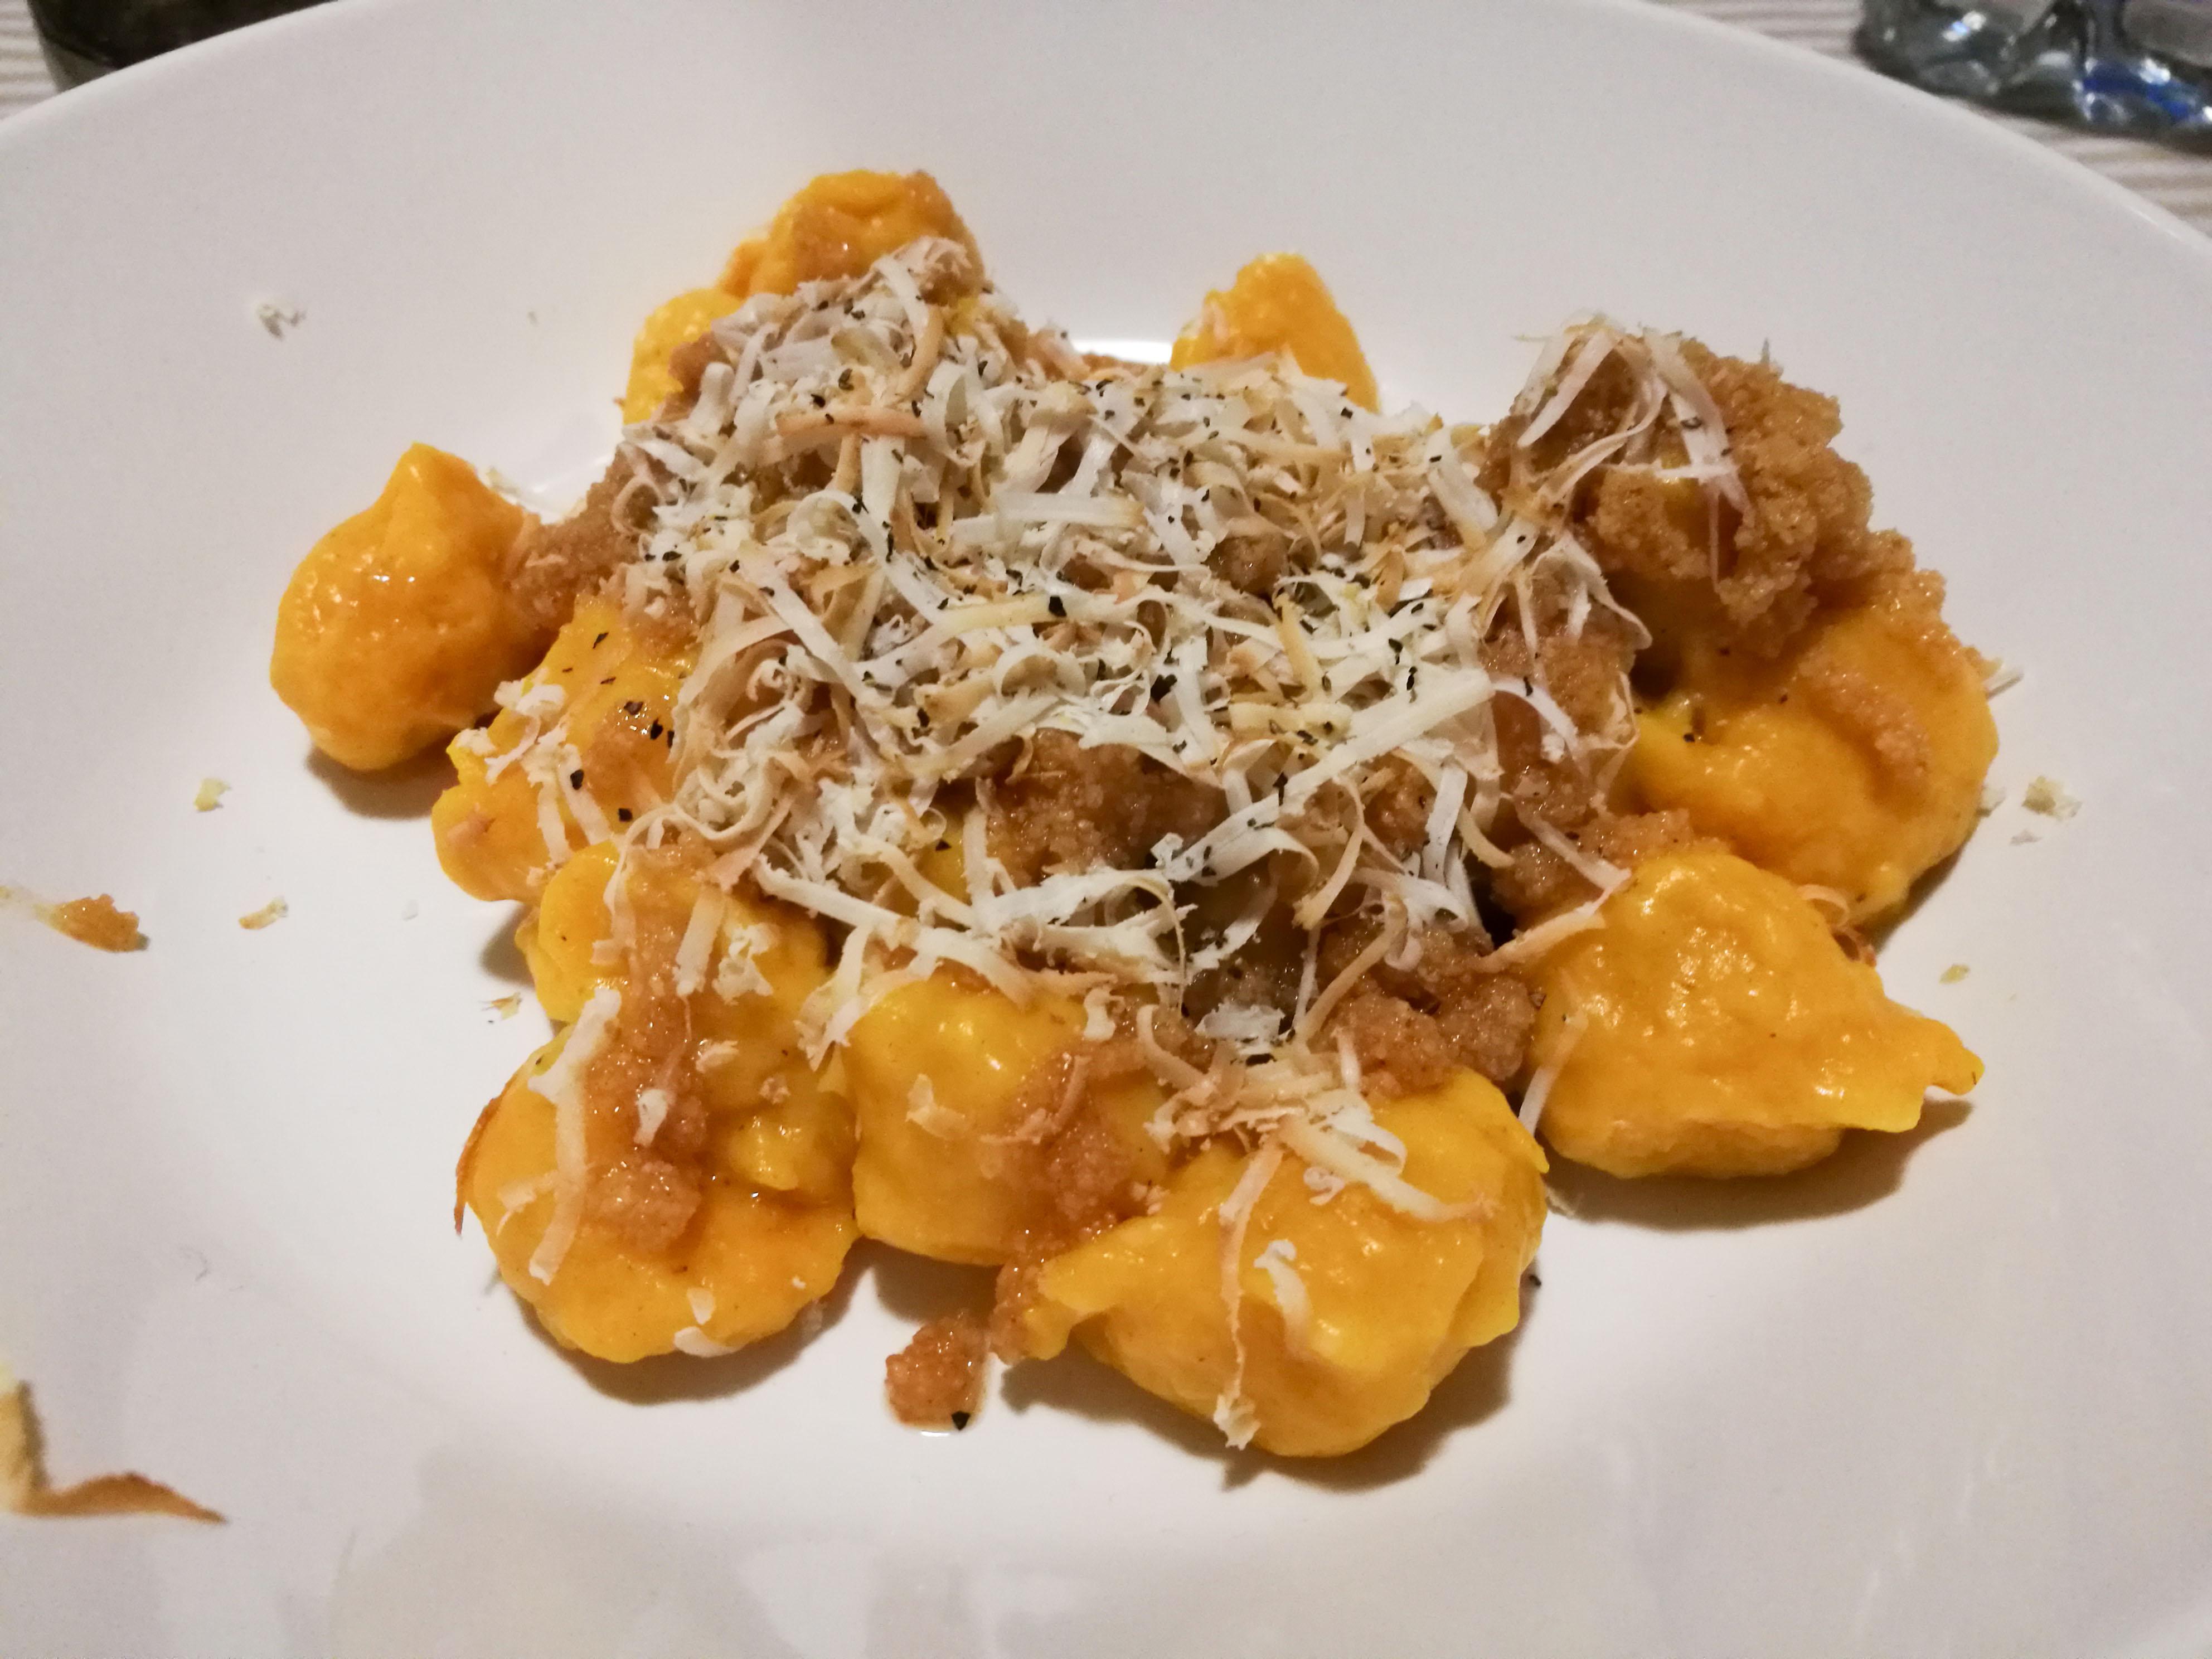 Ricette Bimby Gnocchi Zucca.Gnocchi Di Zucca Al Cucchiaio Bimby Mamma In Pasta